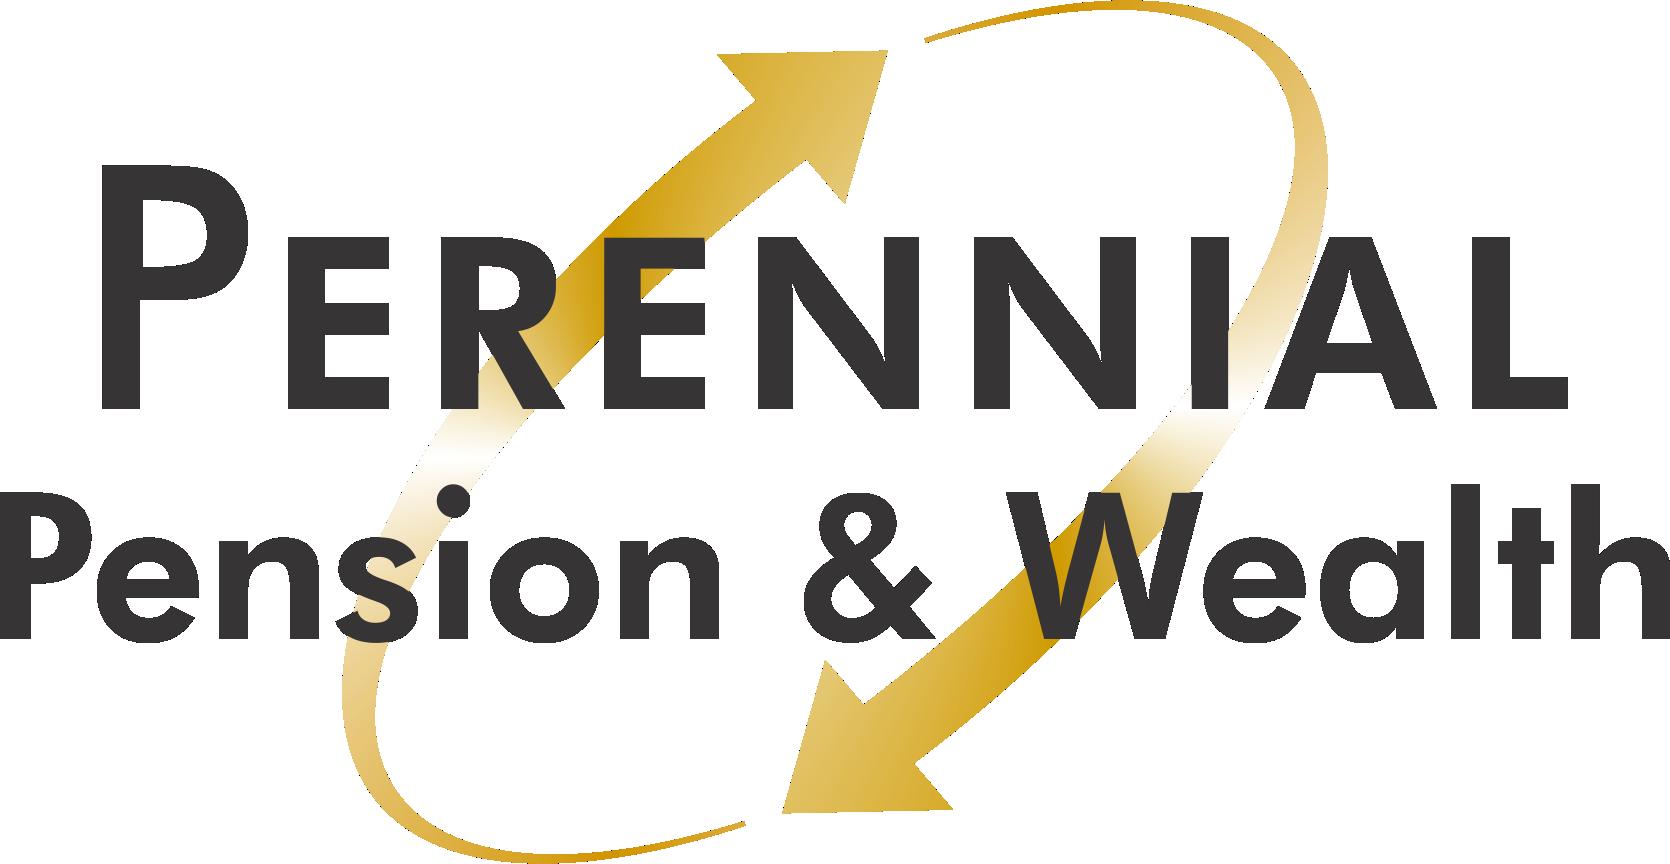 Perennial Pension & Wealth - Roseville, CA